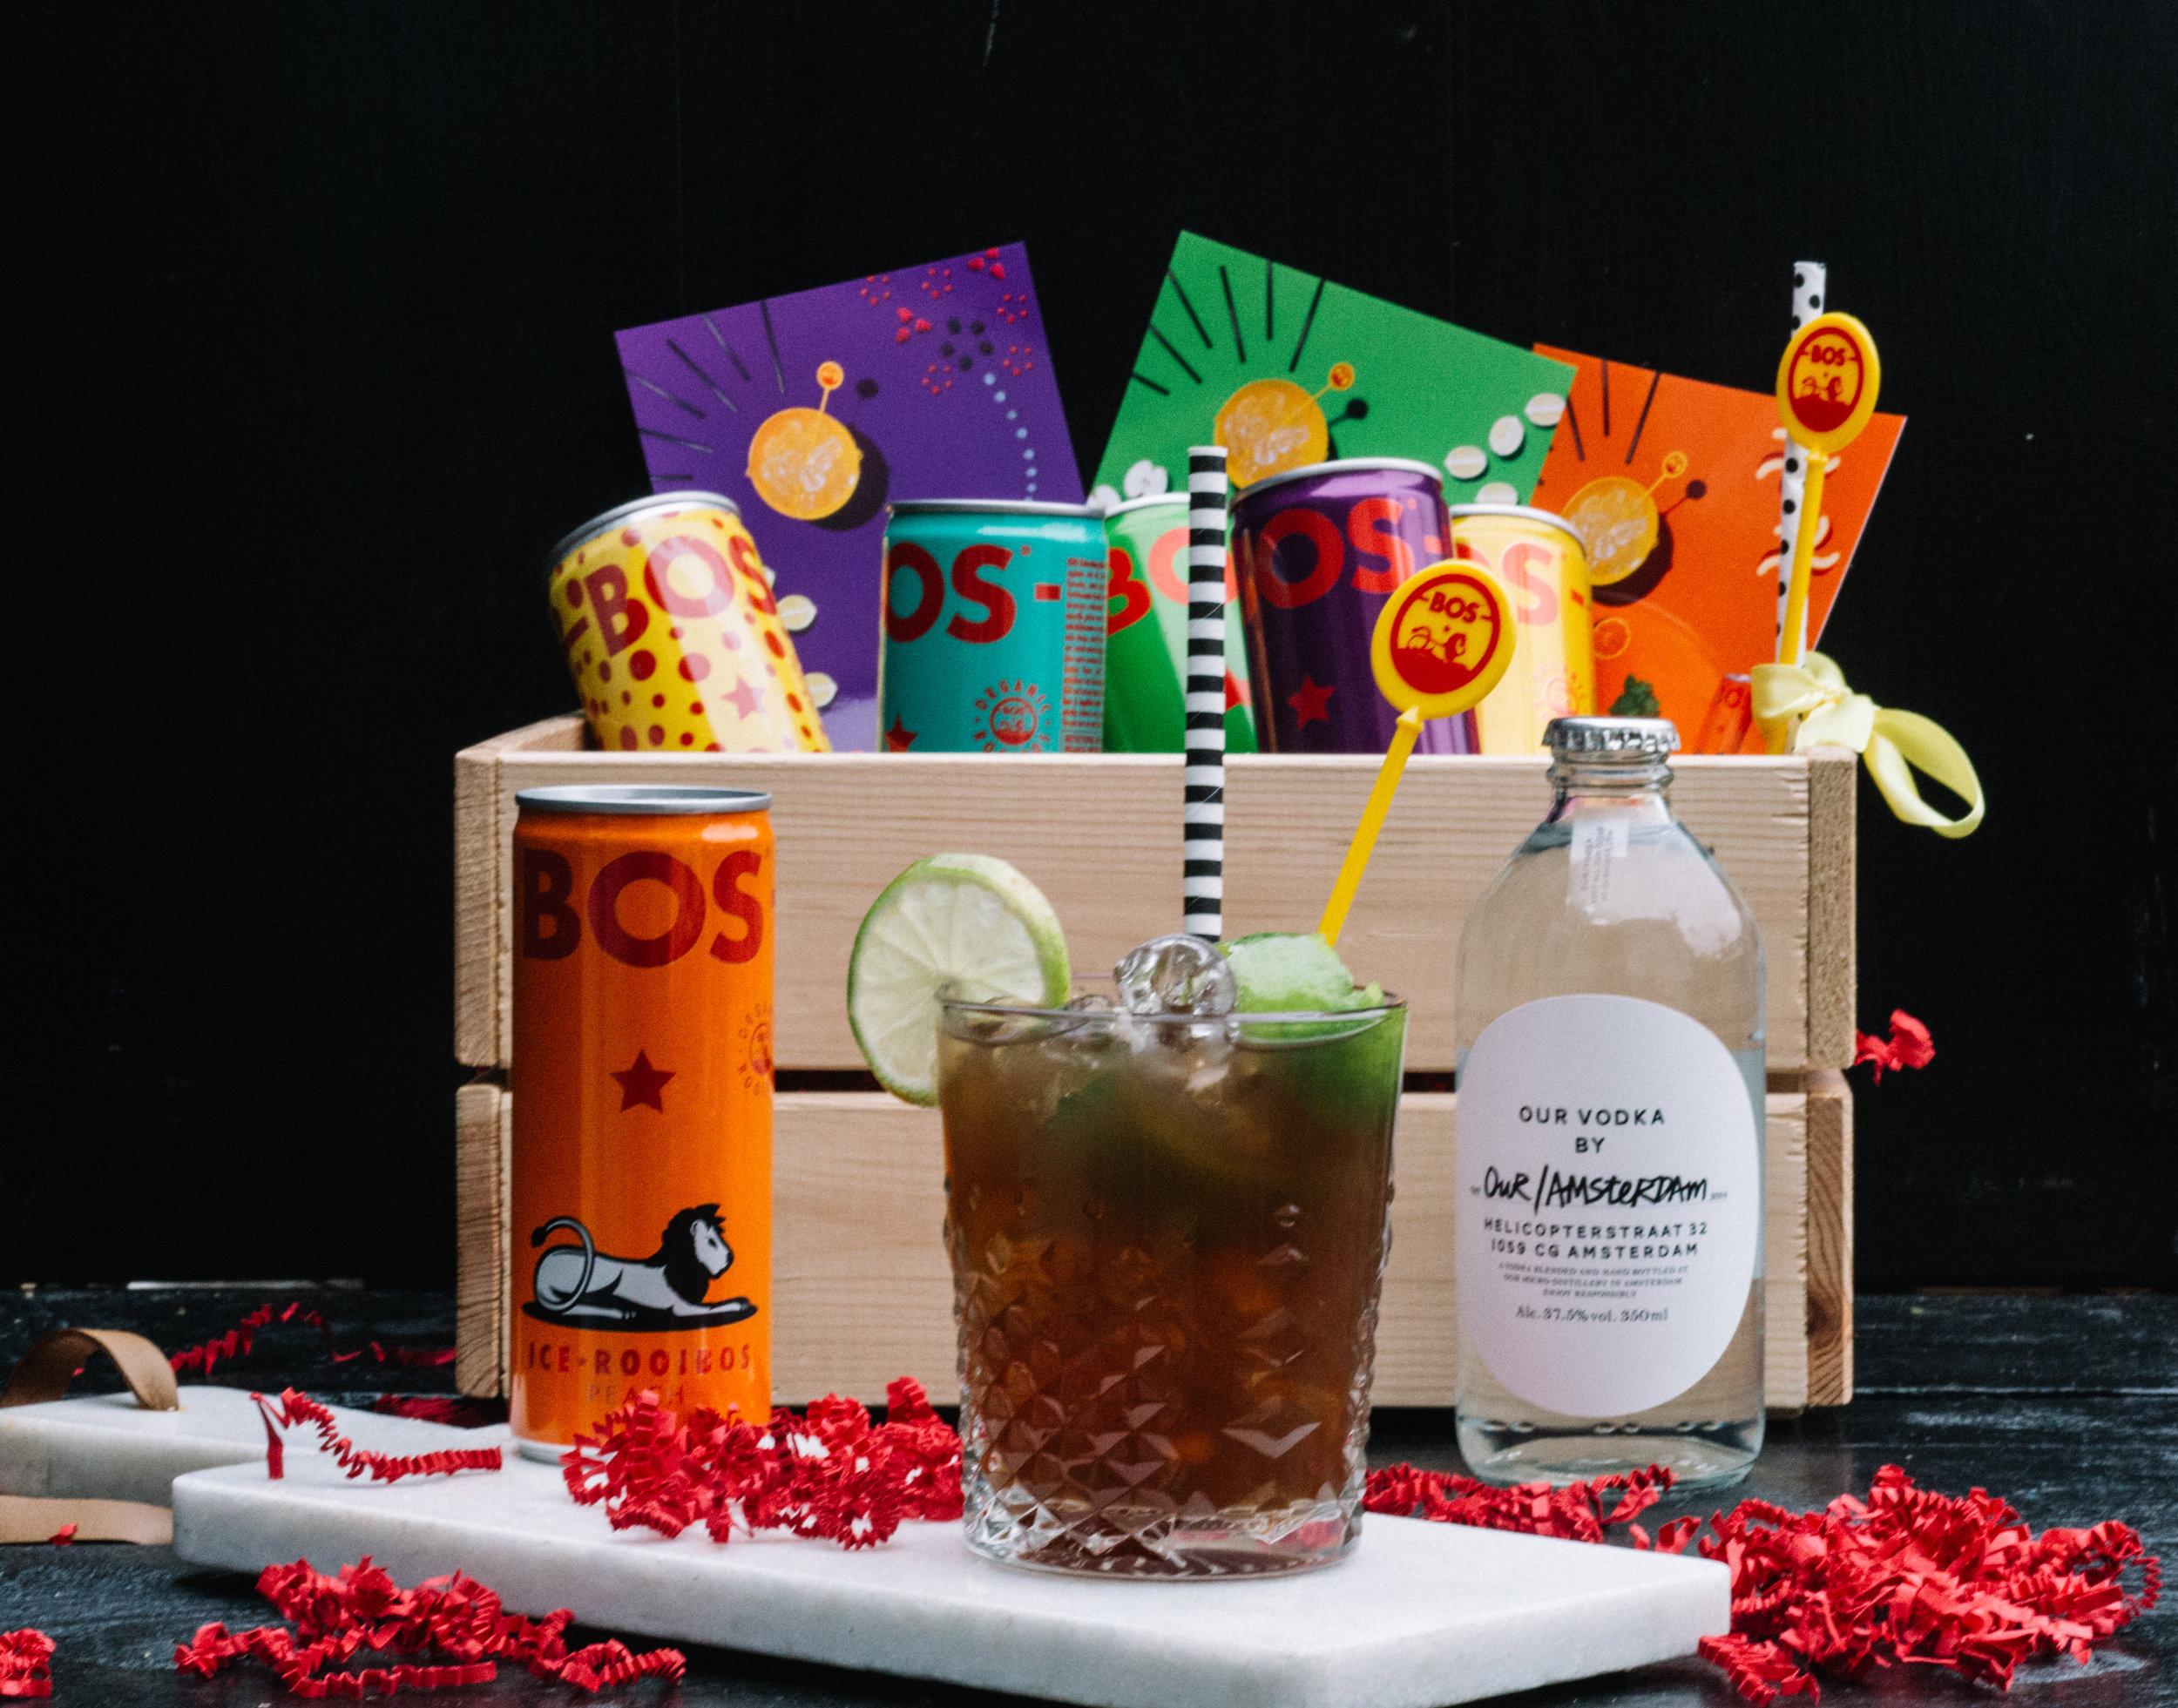 Bos- Cocktail3.jpg